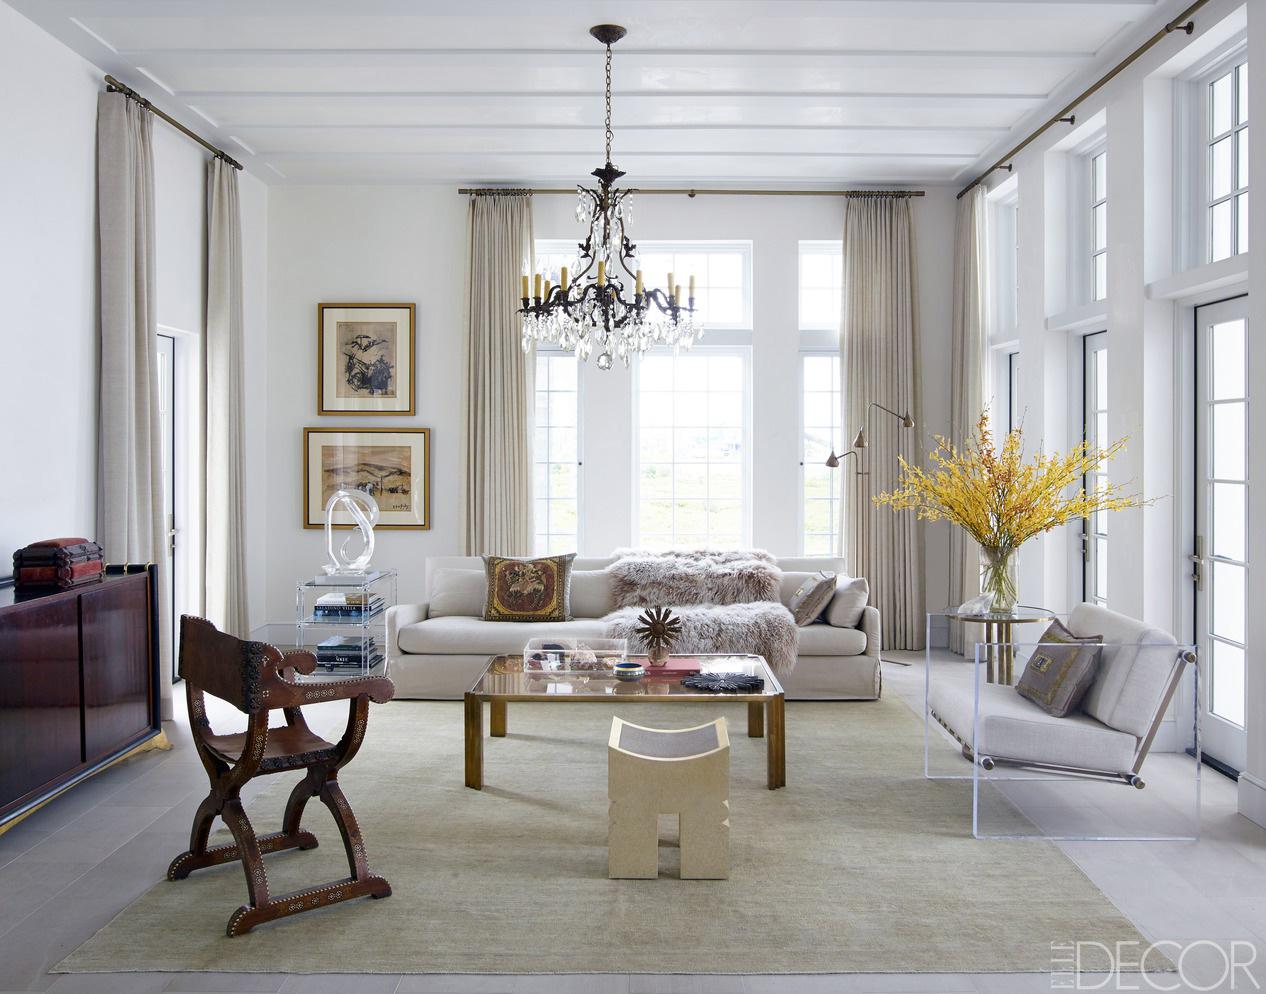 Chic Living Room Decorating Ideas and Design - ELLE DECOR